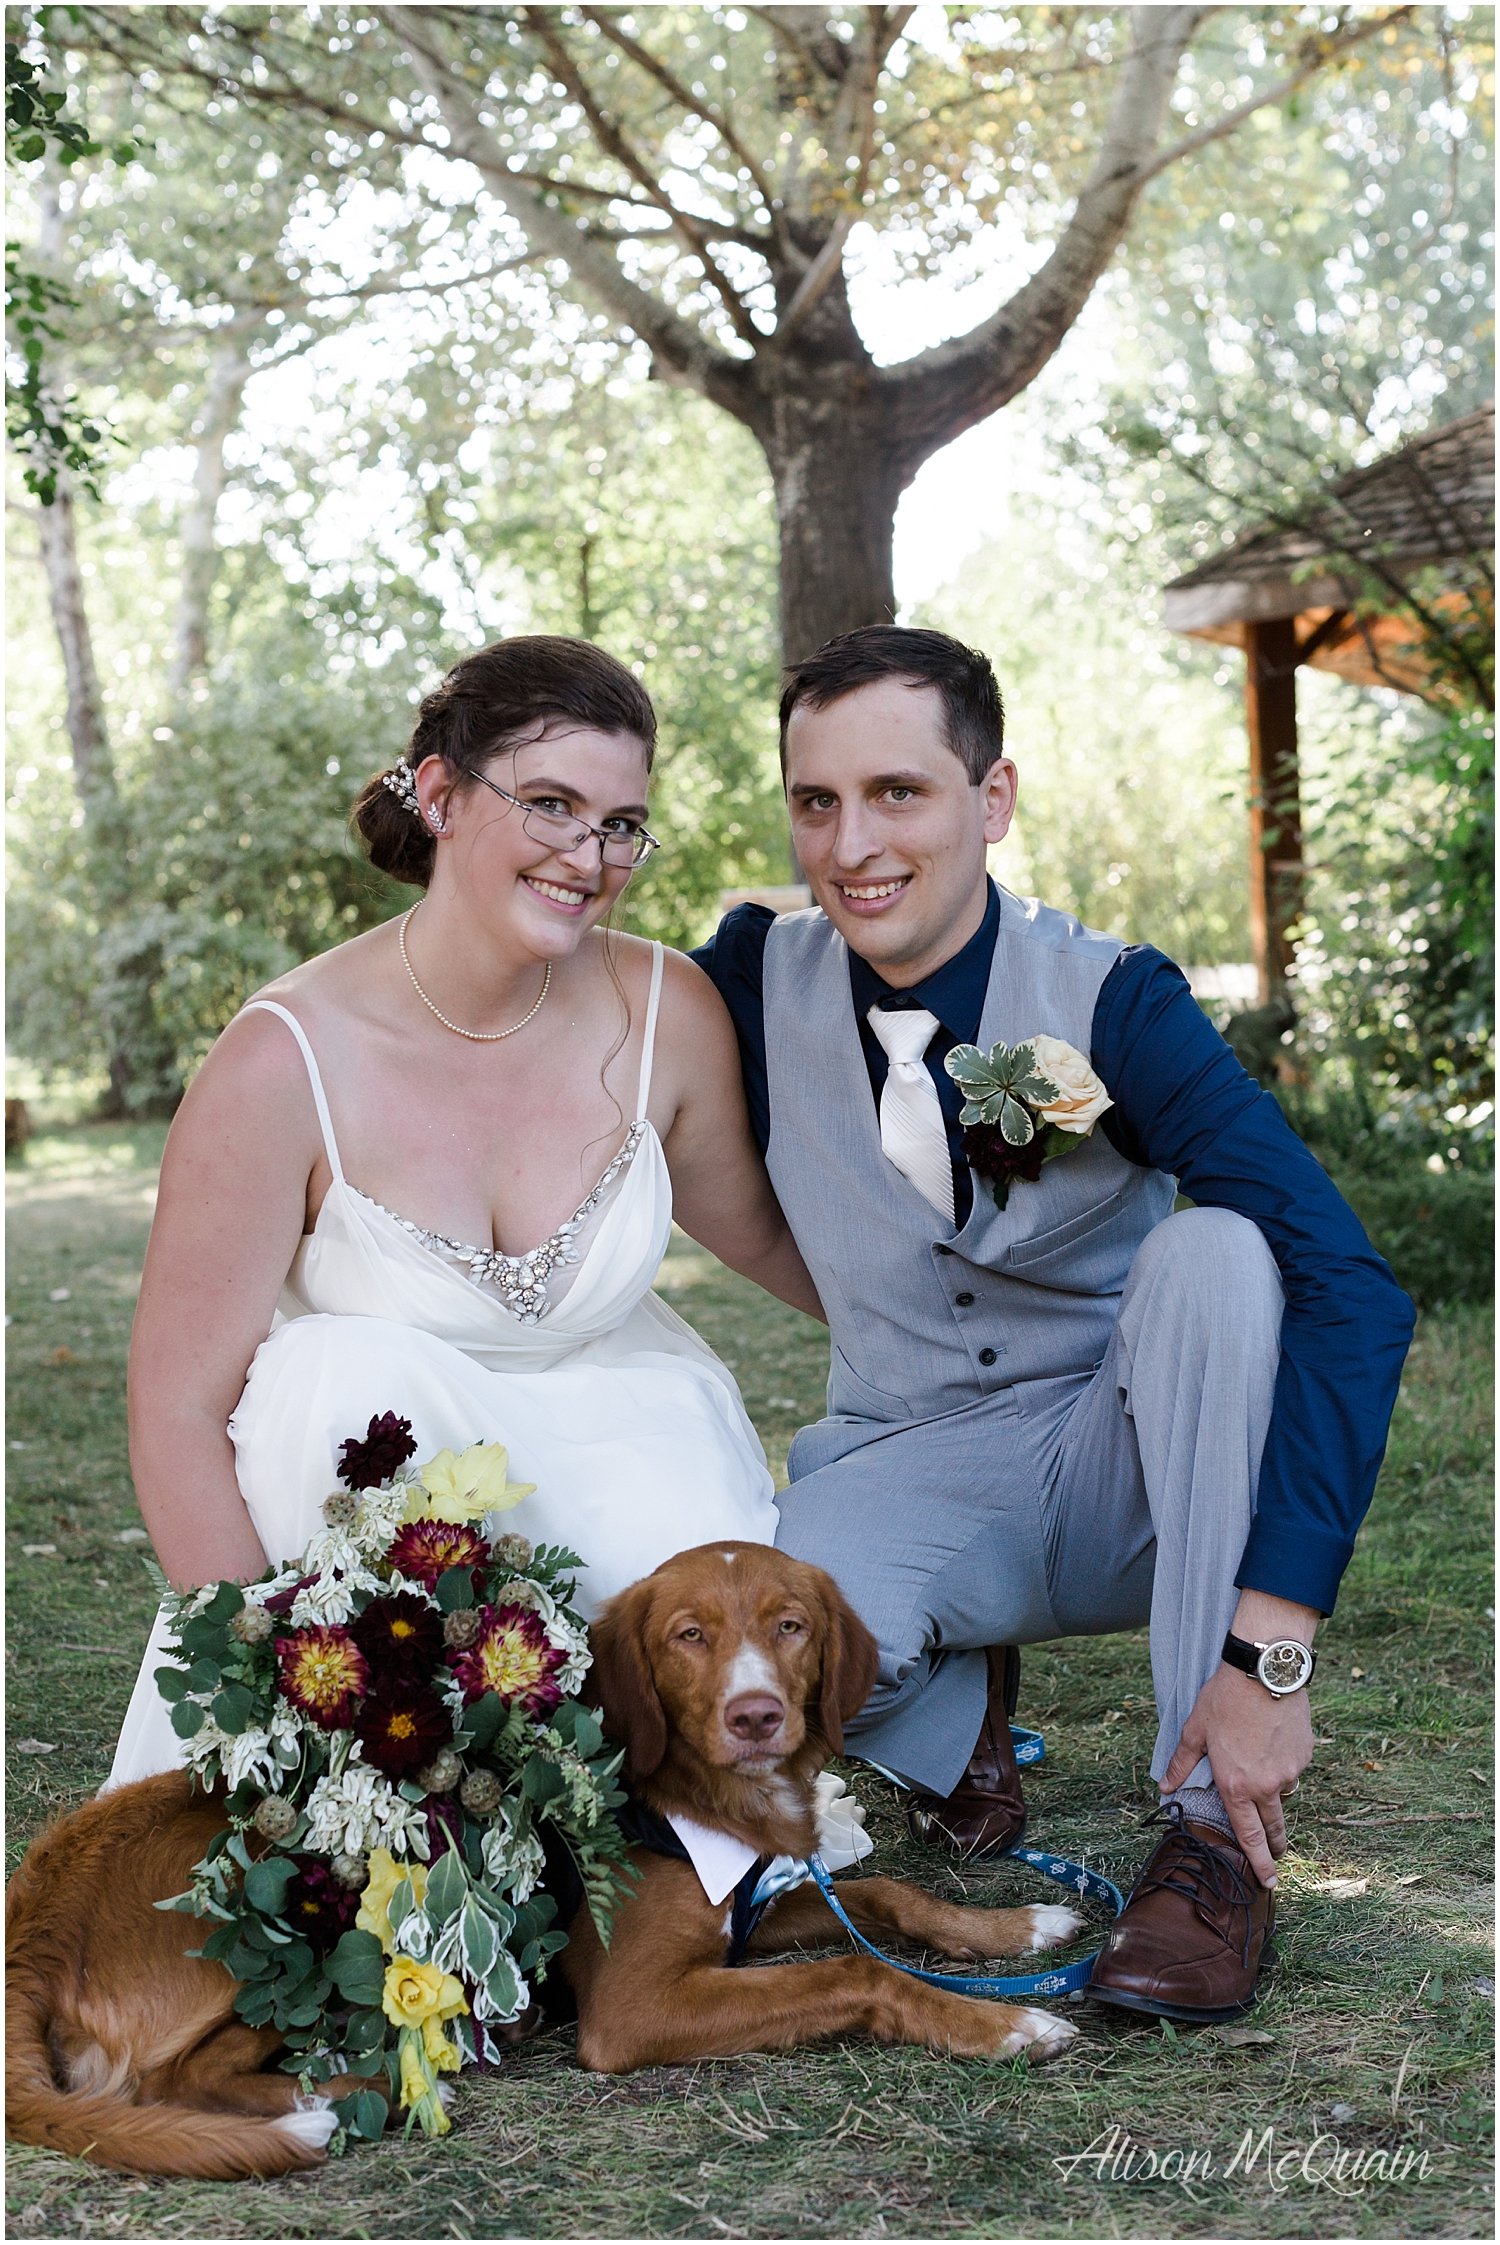 AandJSteb_Longmont_Colorado_Wedding_AMPhoto_Aug2018_0012.jpg